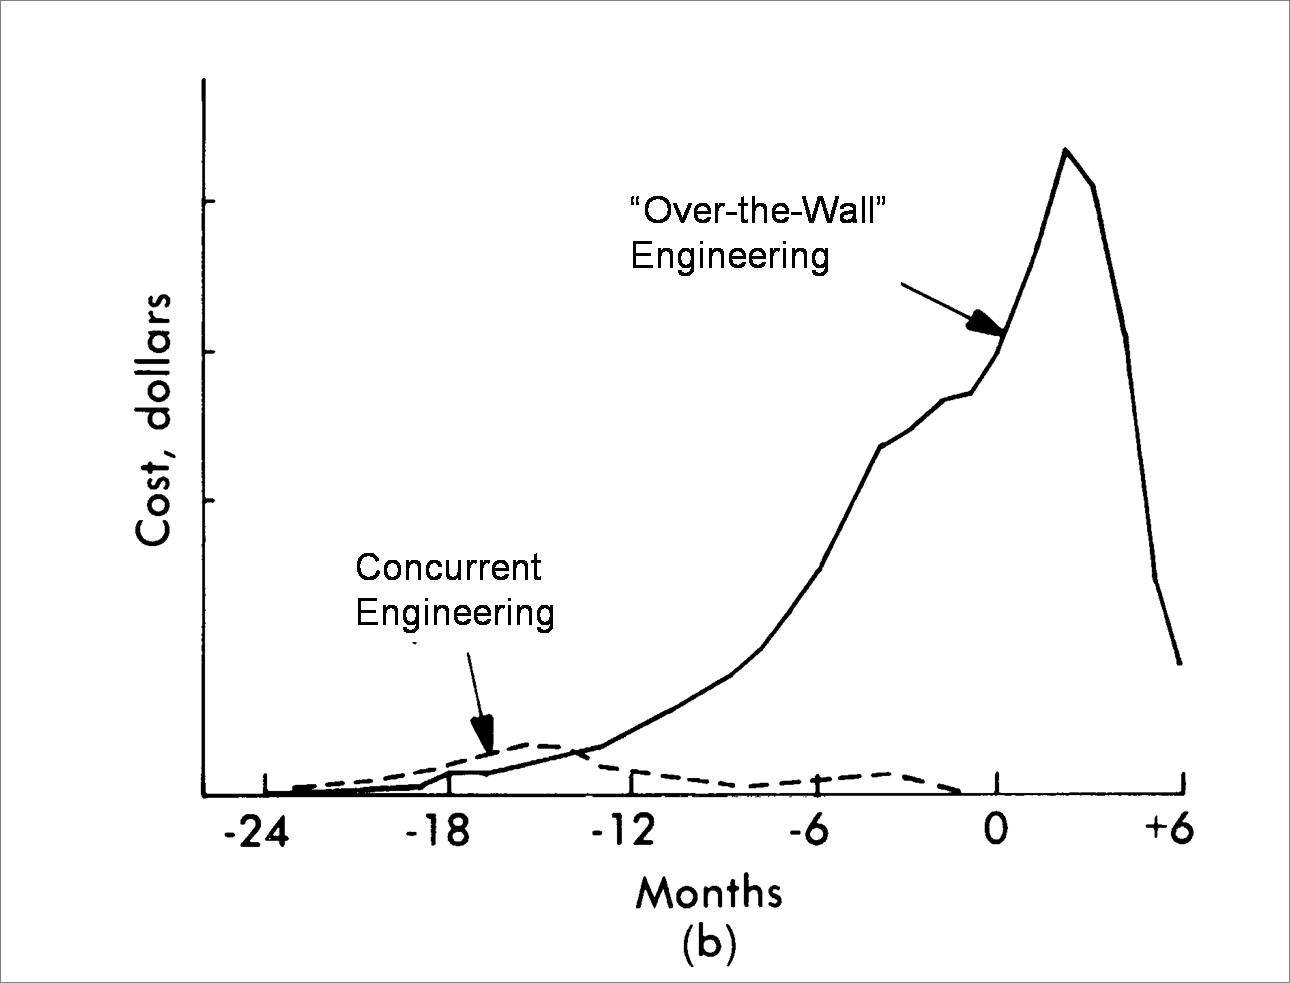 Concurrent Engineering New Product Design Diagram Figure 3